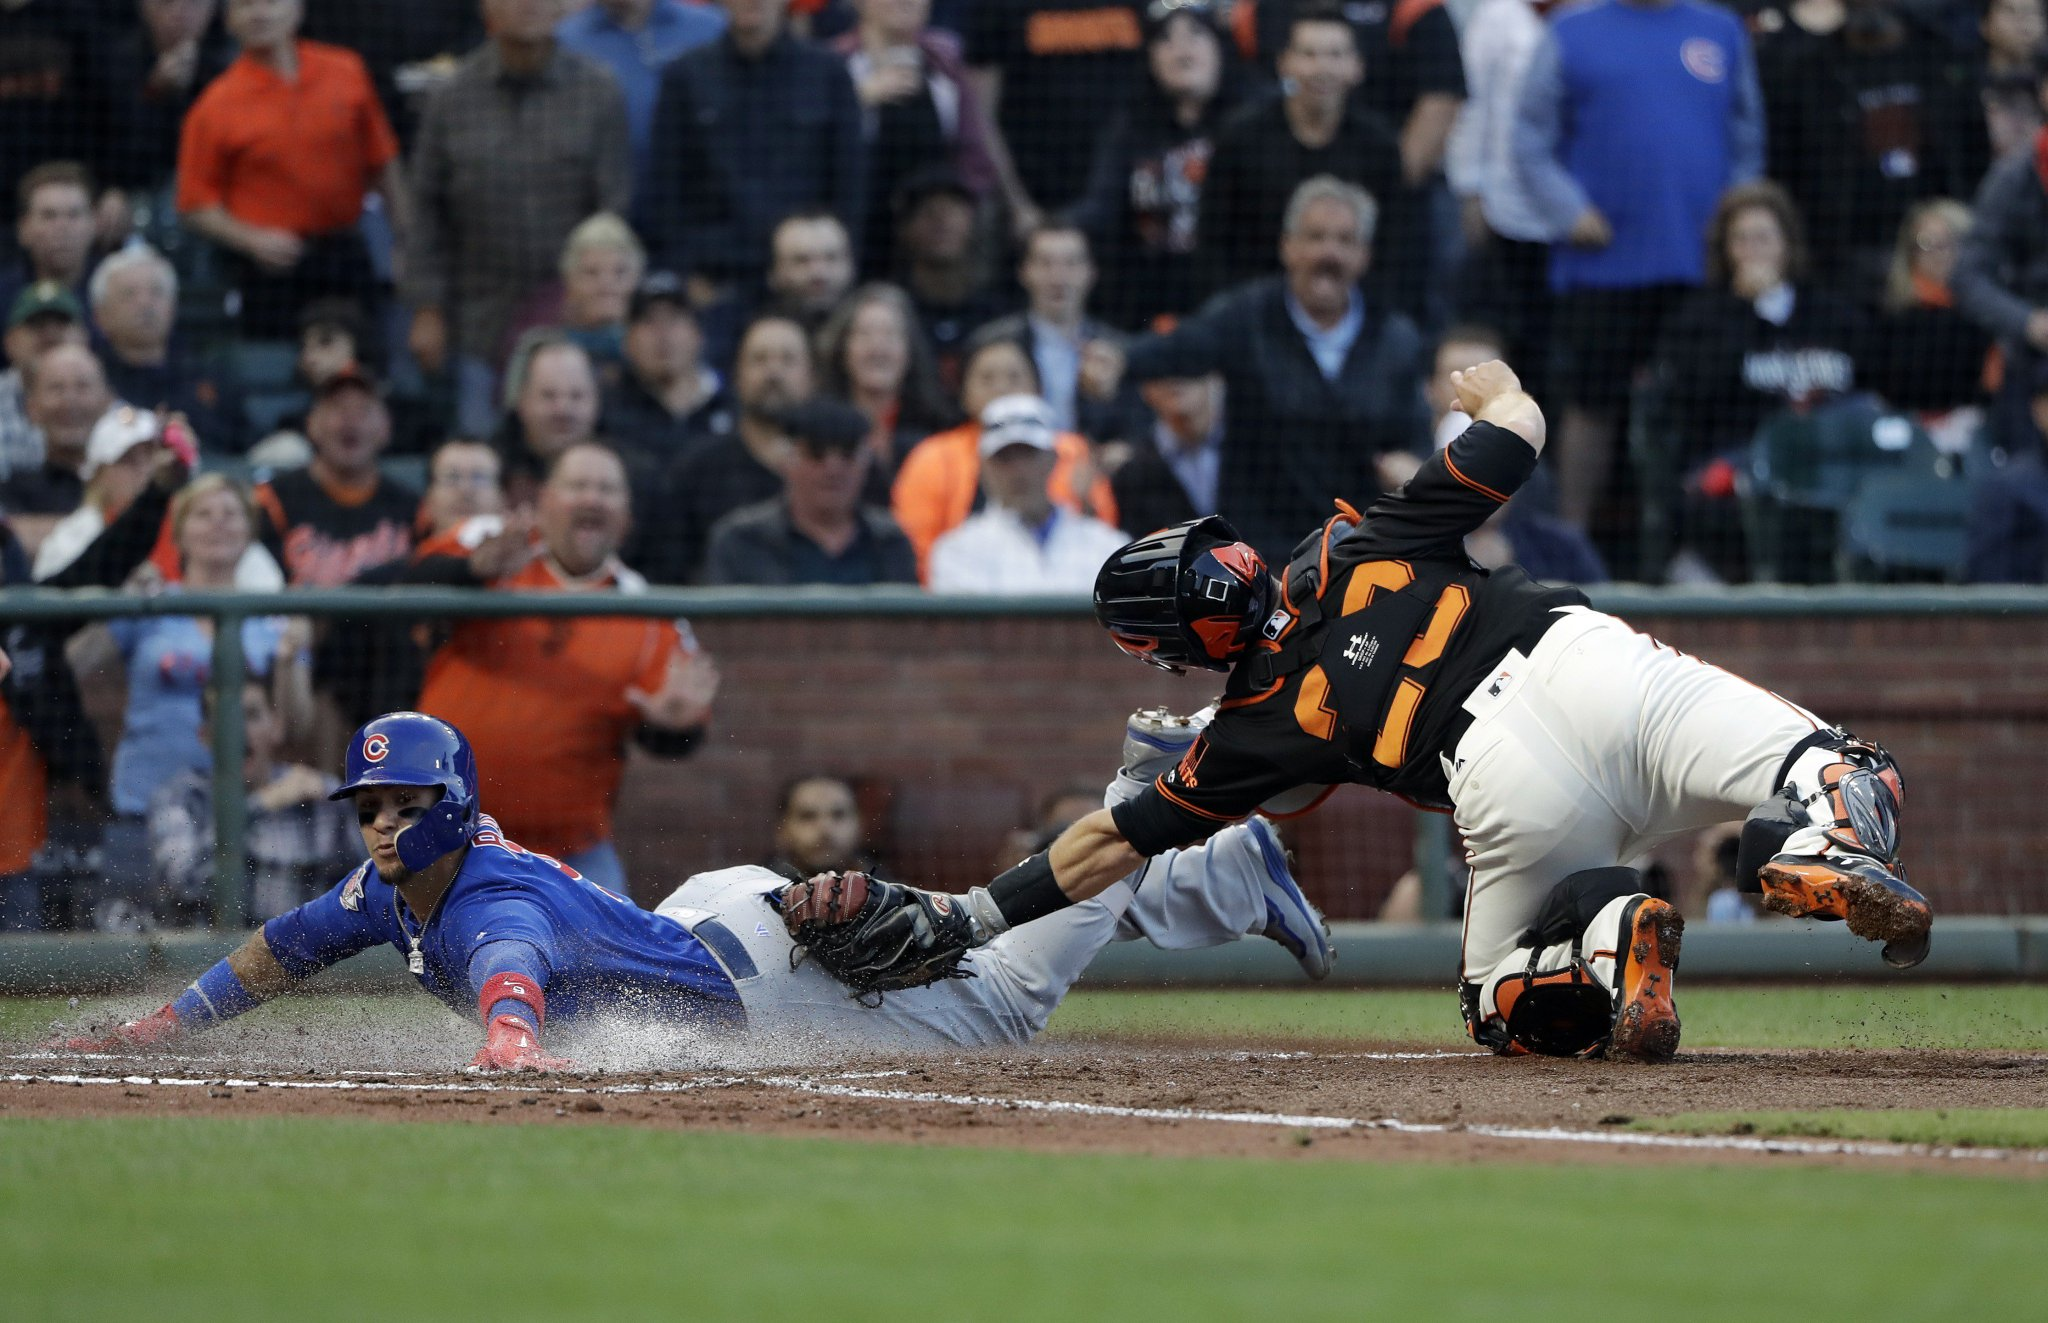 @MLB That Snip 'N Slide finish, too ... https://t.co/cmQB0ZebPs https://t.co/DAAancZRKL